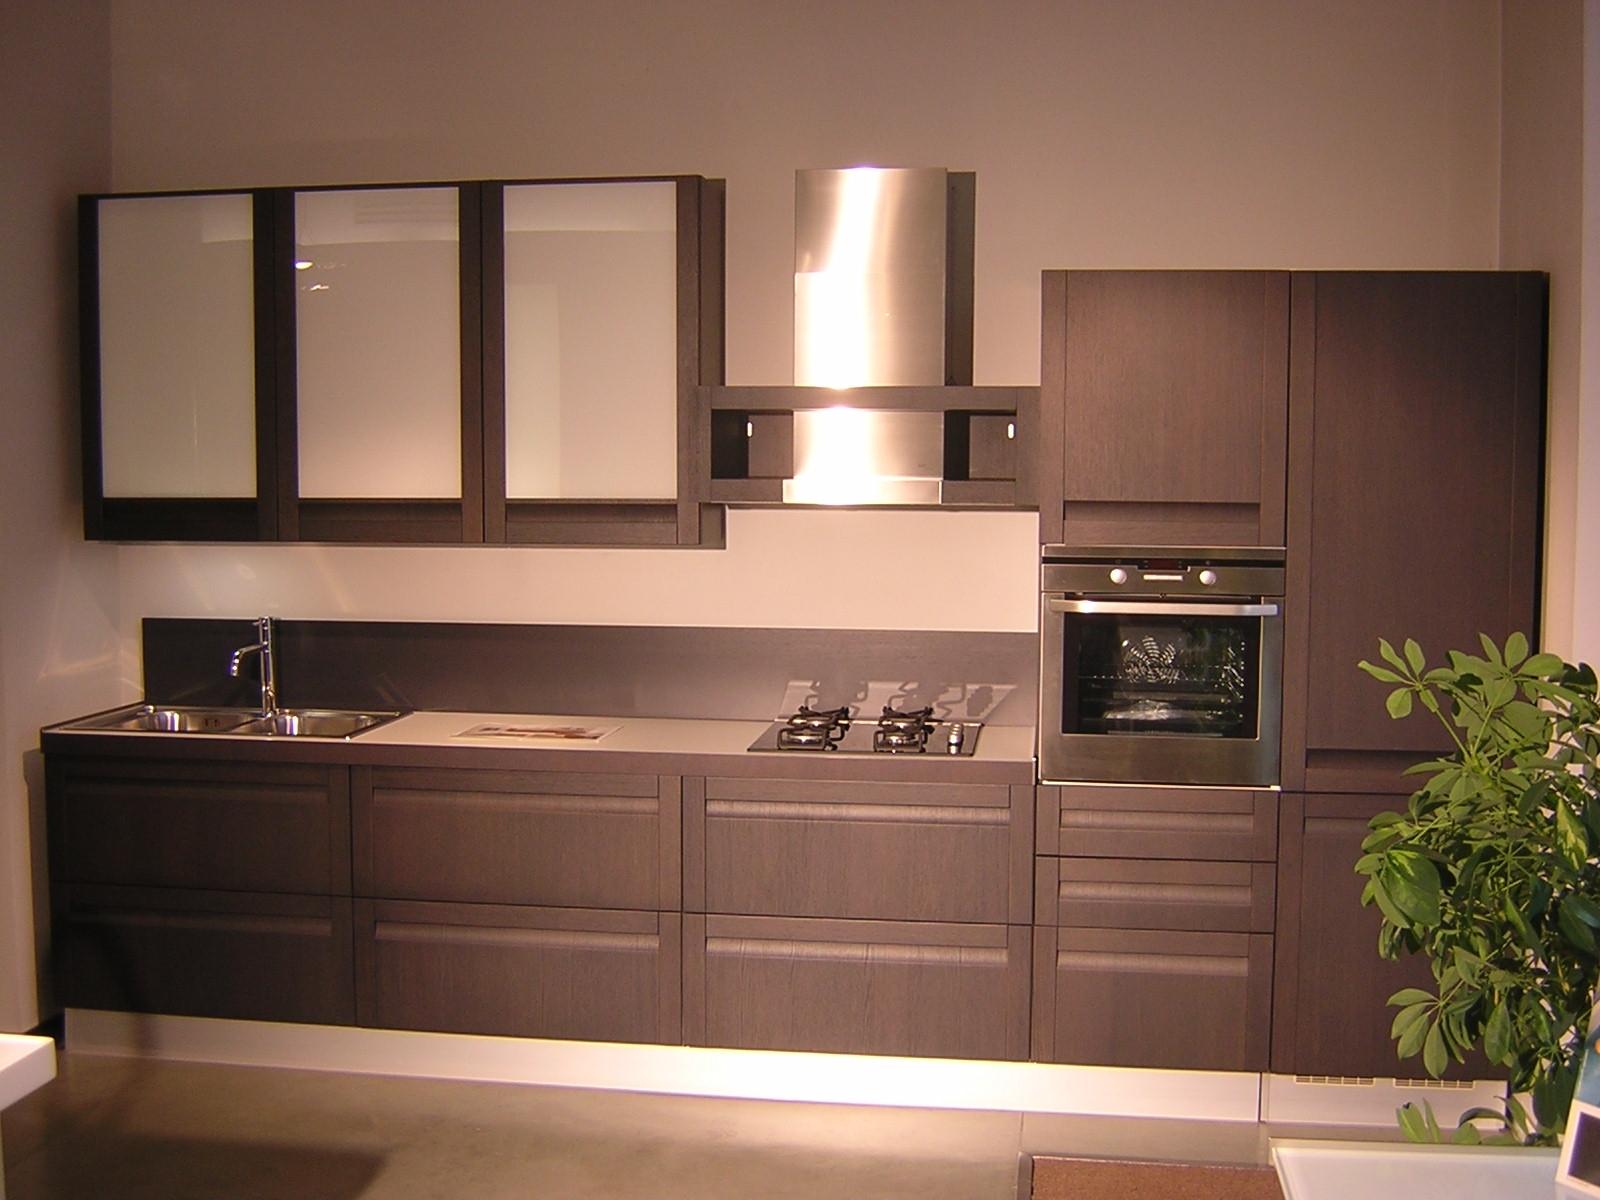 Profondit mobili cucina finest ivar pino grigio larghezza cm profondit with profondit mobili - Larghezza mobili cucina ...